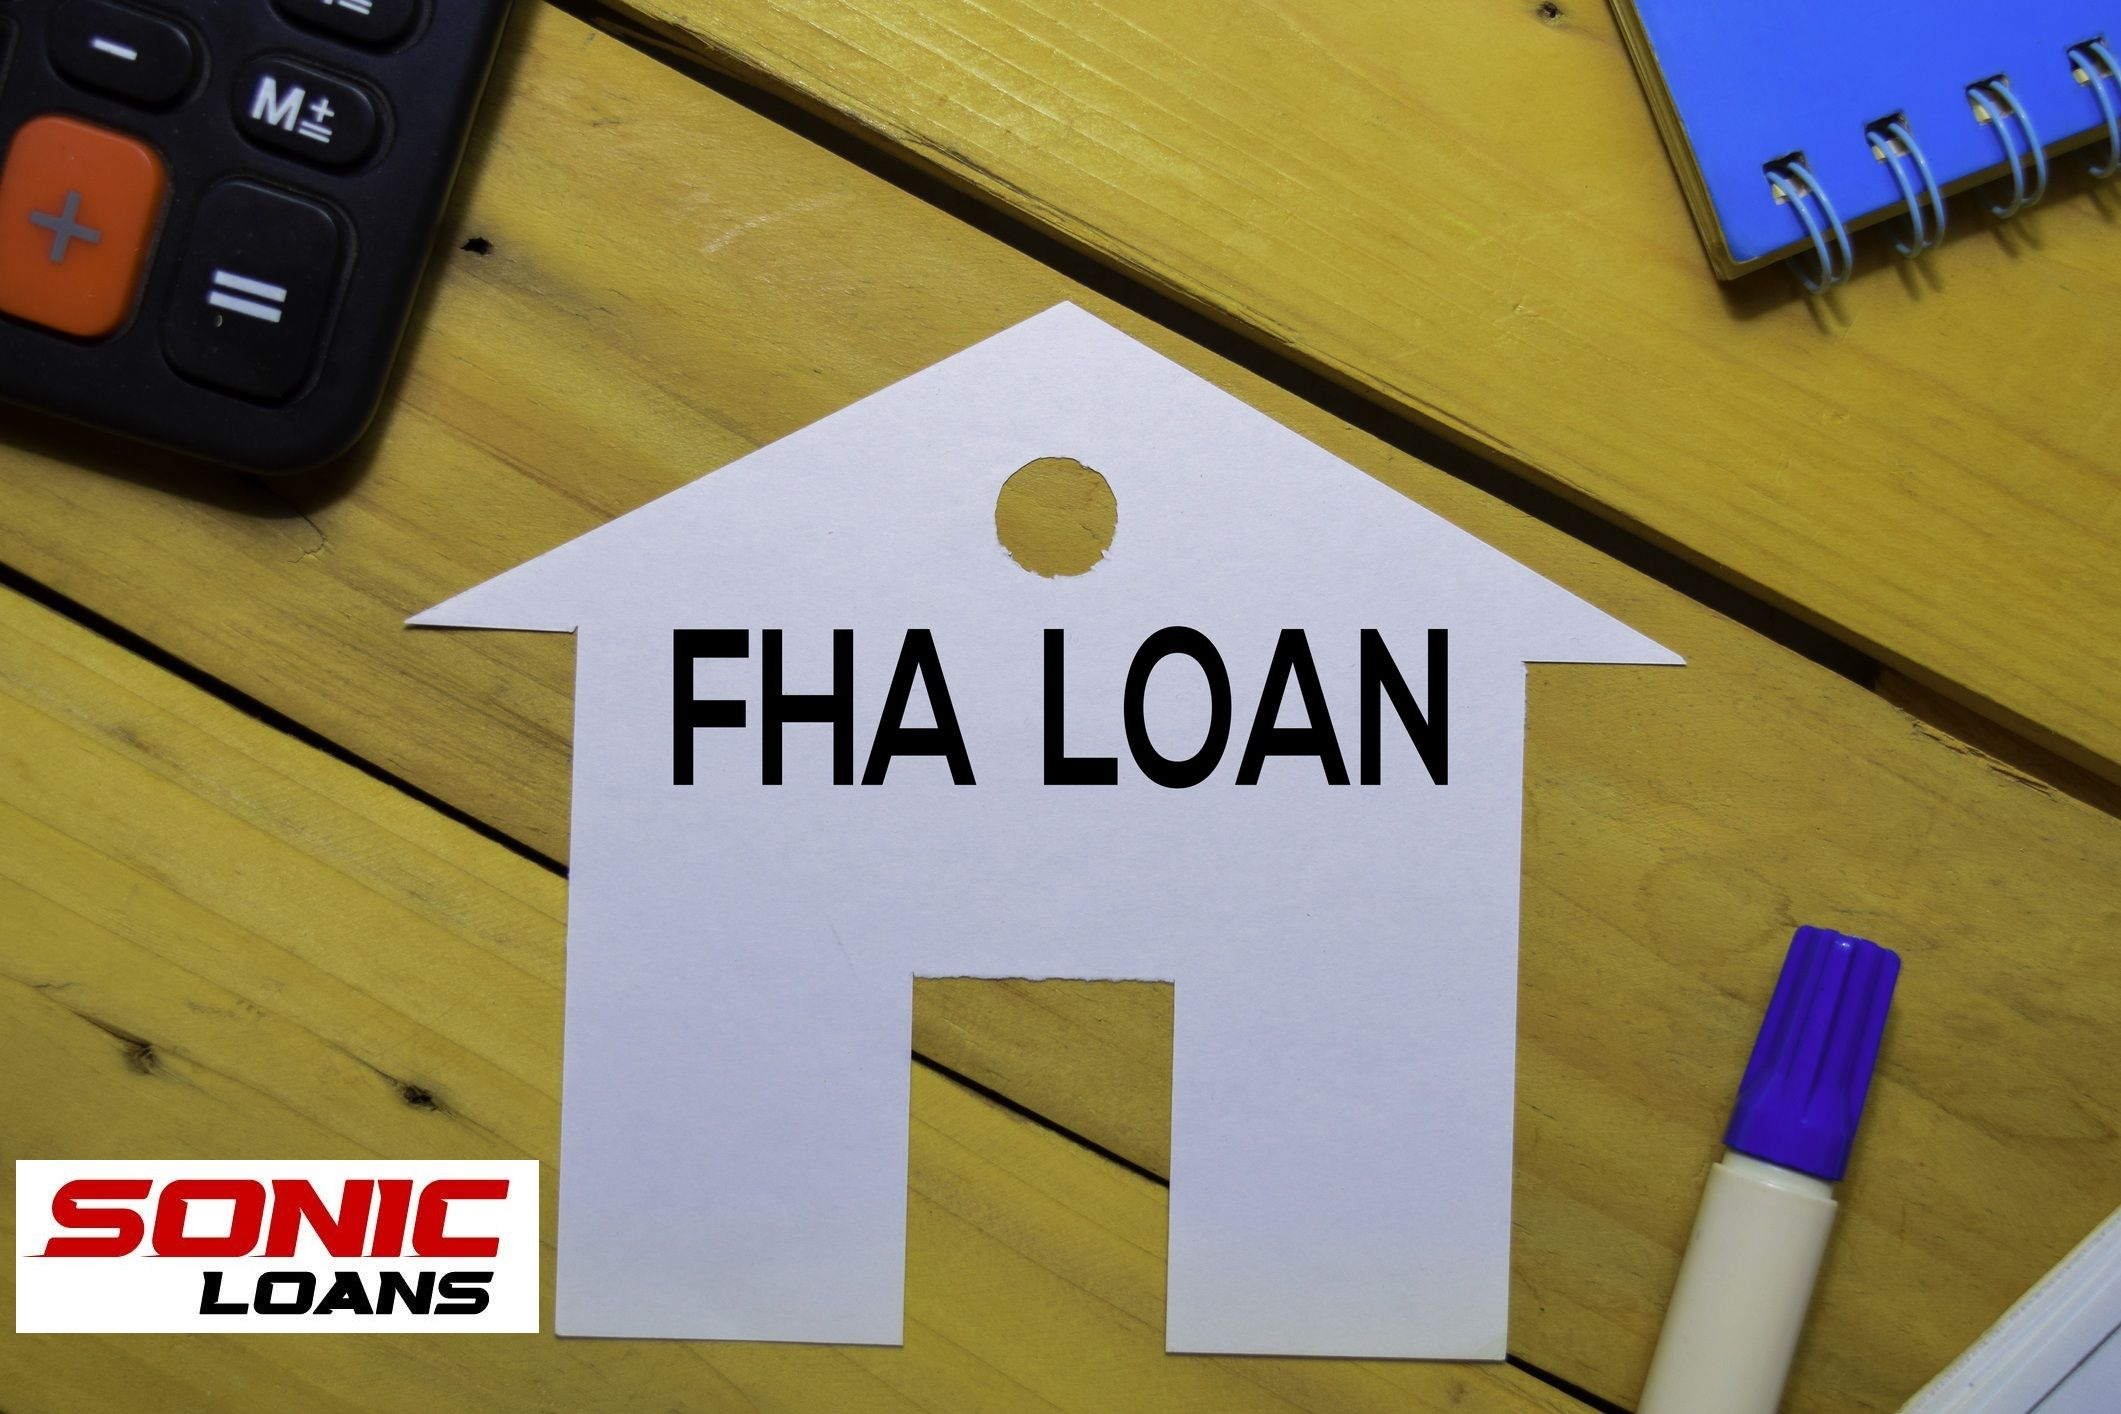 Fha Loan Michigan In 2020 Fha Loans Fha Refinance Loans